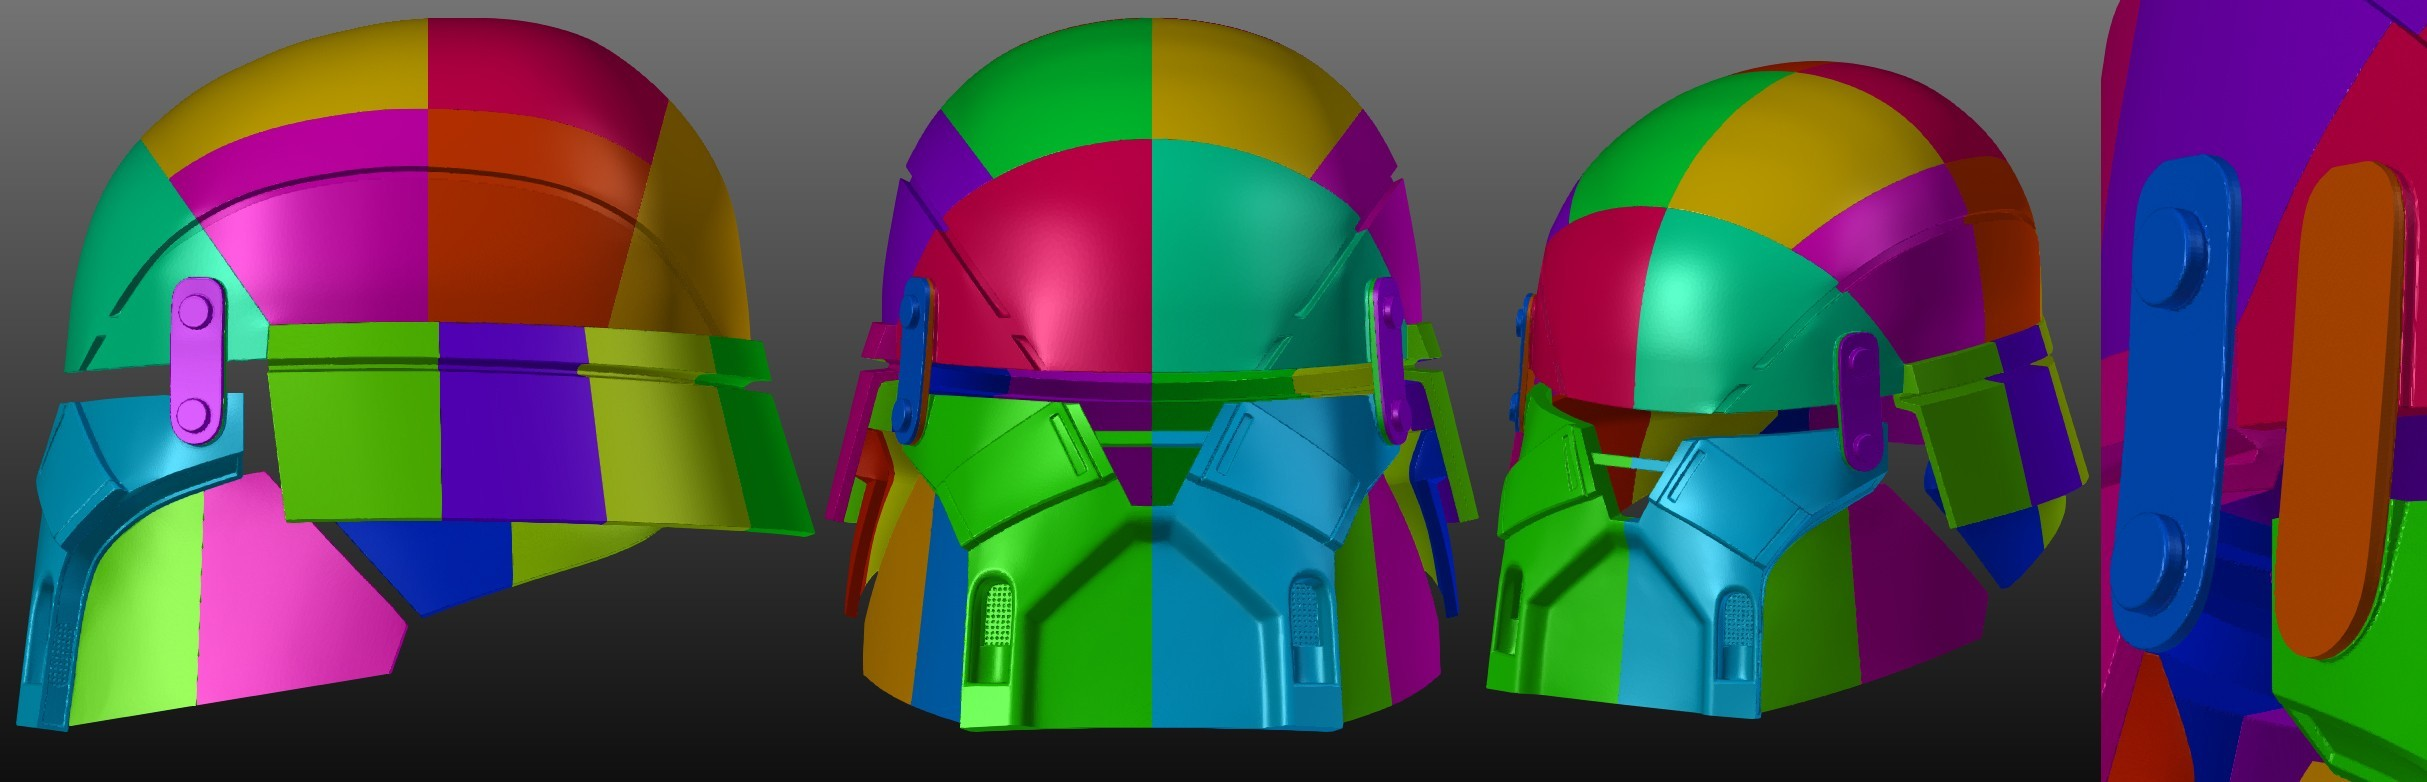 Armory_Fianal.jpg Download STL file Armory - Knights of Ren Helmet, StarWars model for 3D Print • 3D printing design, 3D-mon